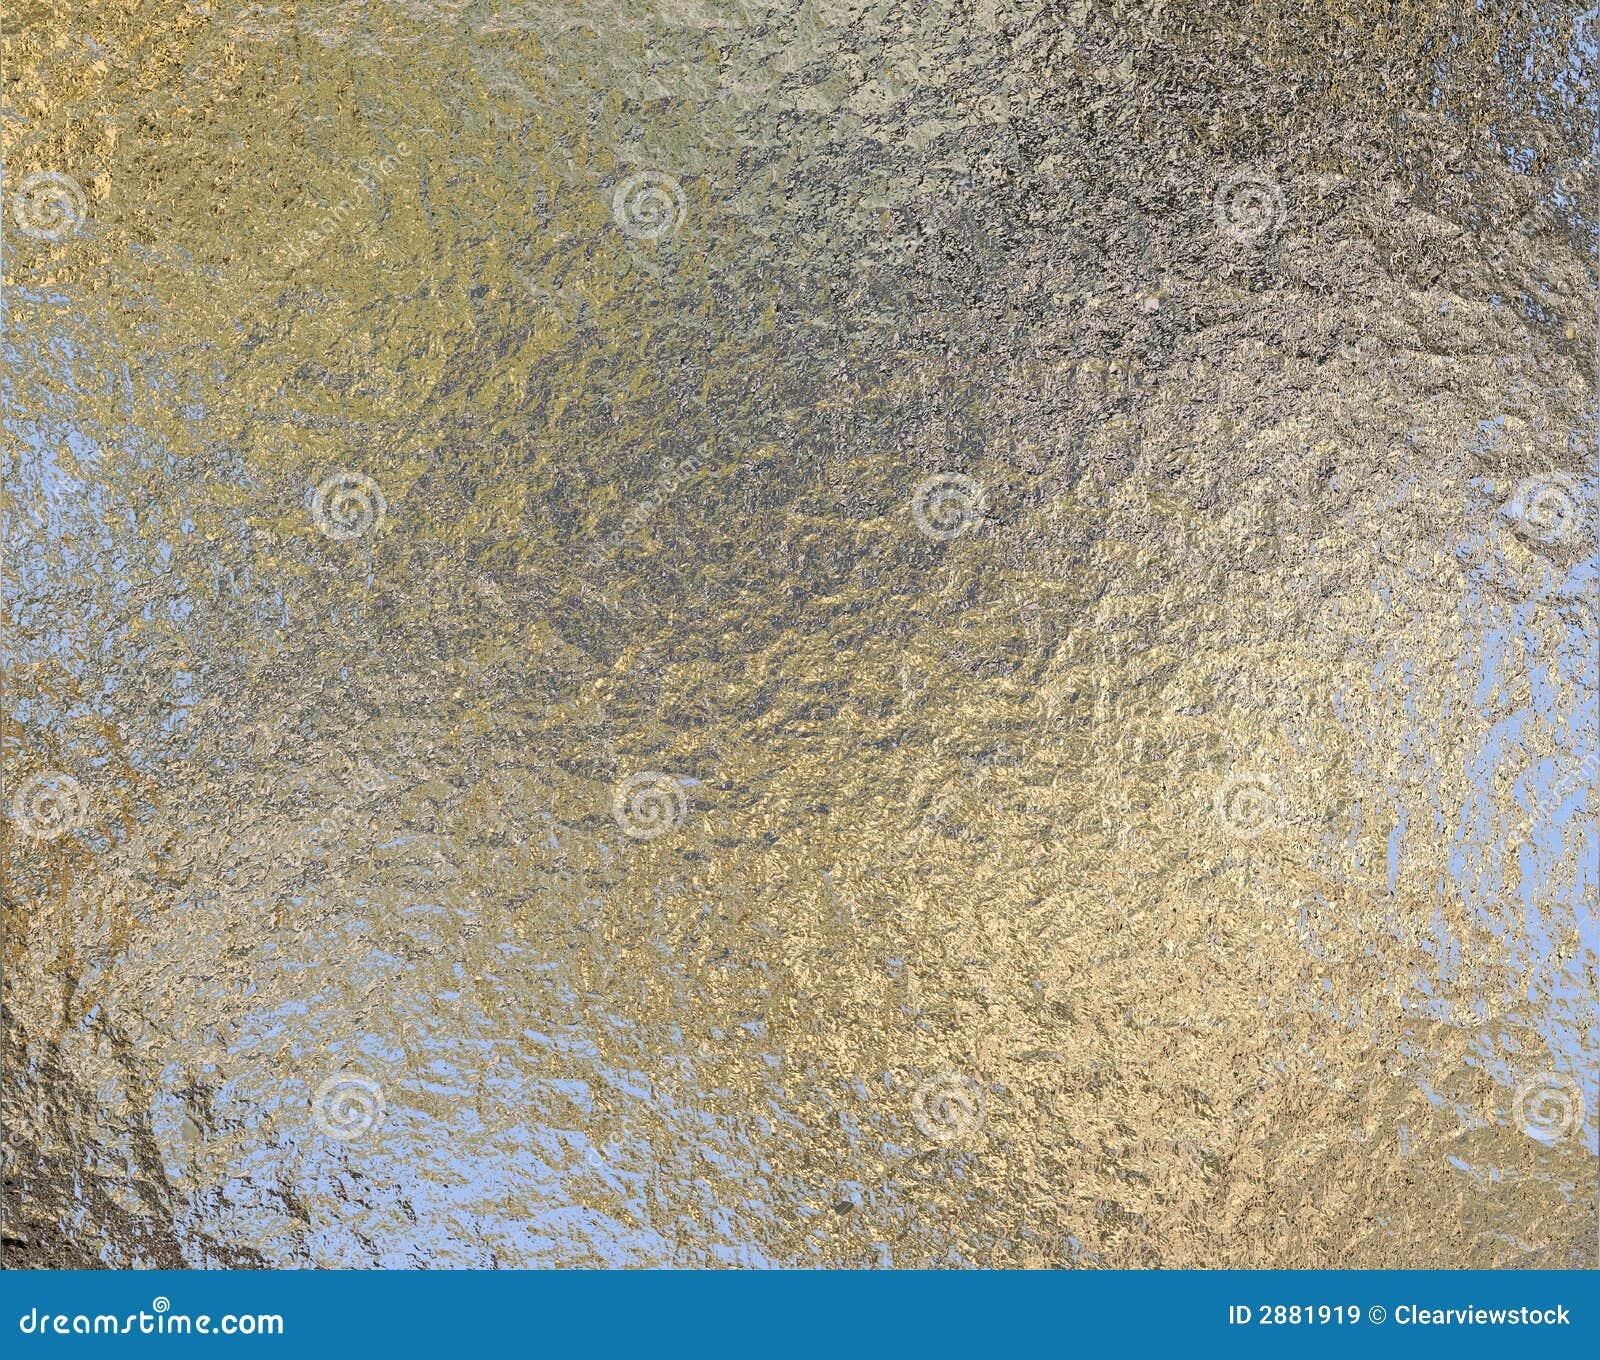 Tin foil shiny metal texture